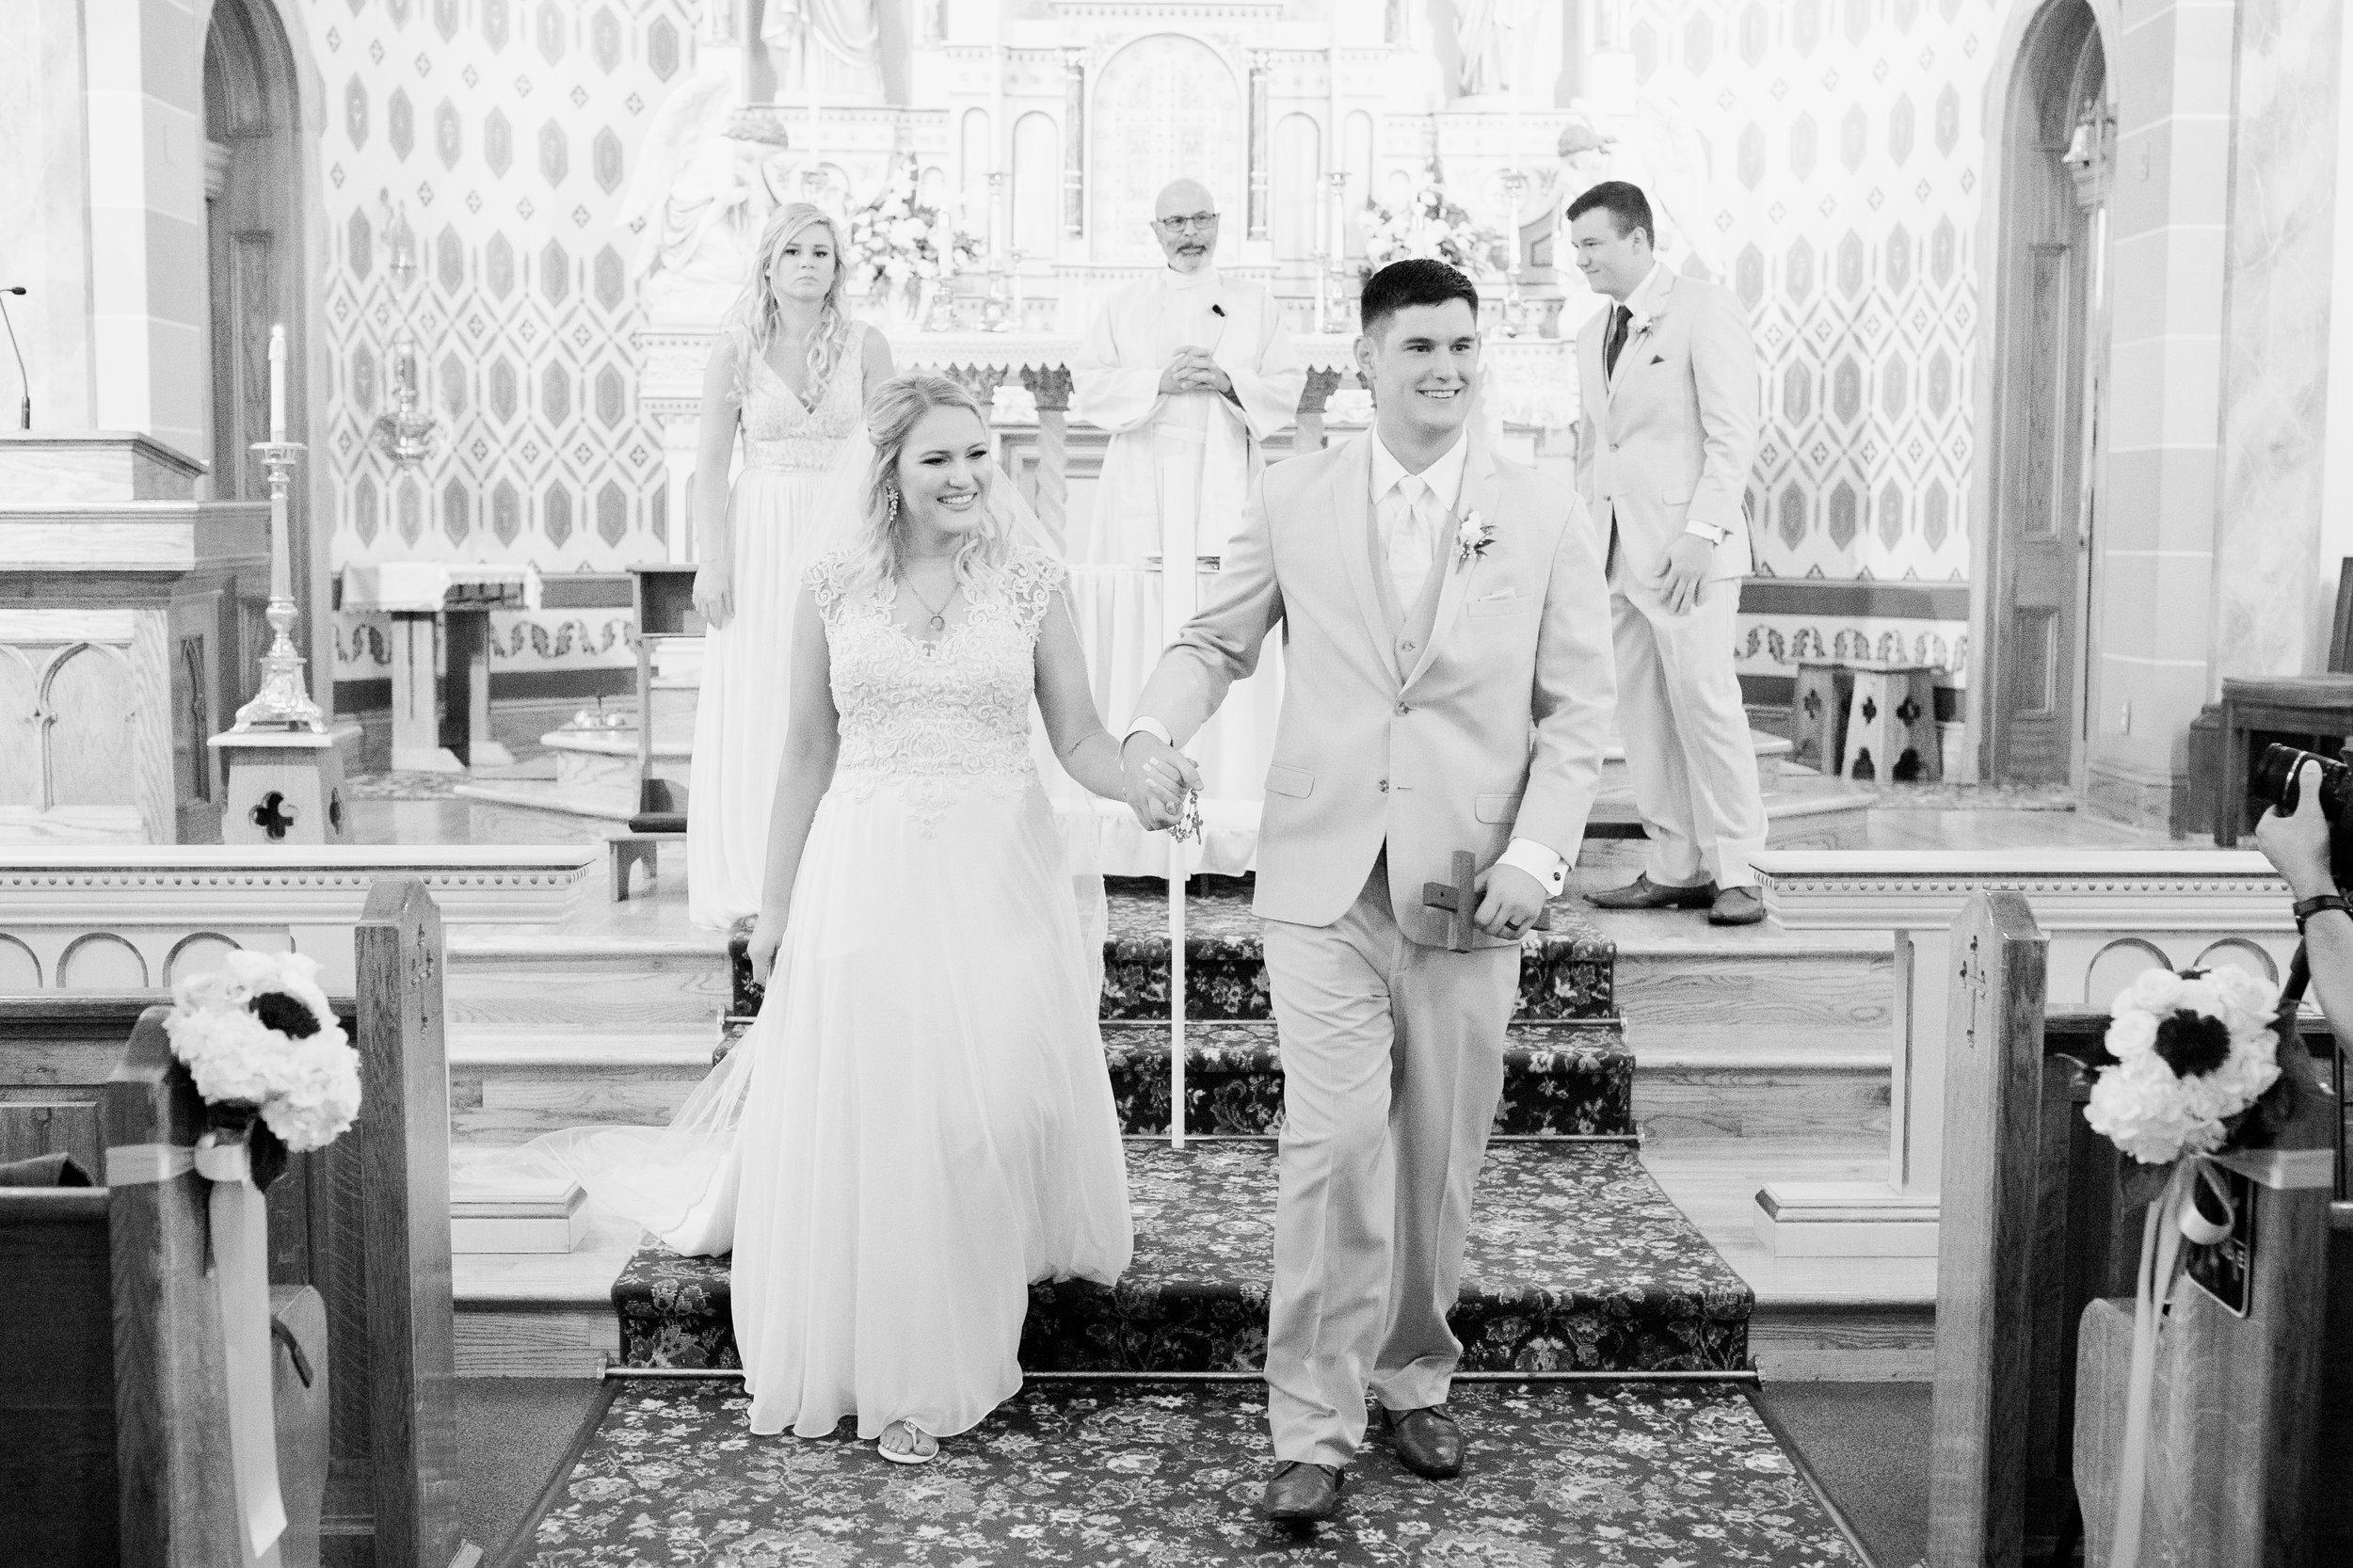 Dorothy_Louise_Photography_Marissa_Jake_Wentzville_MO_Wedding-114.jpg